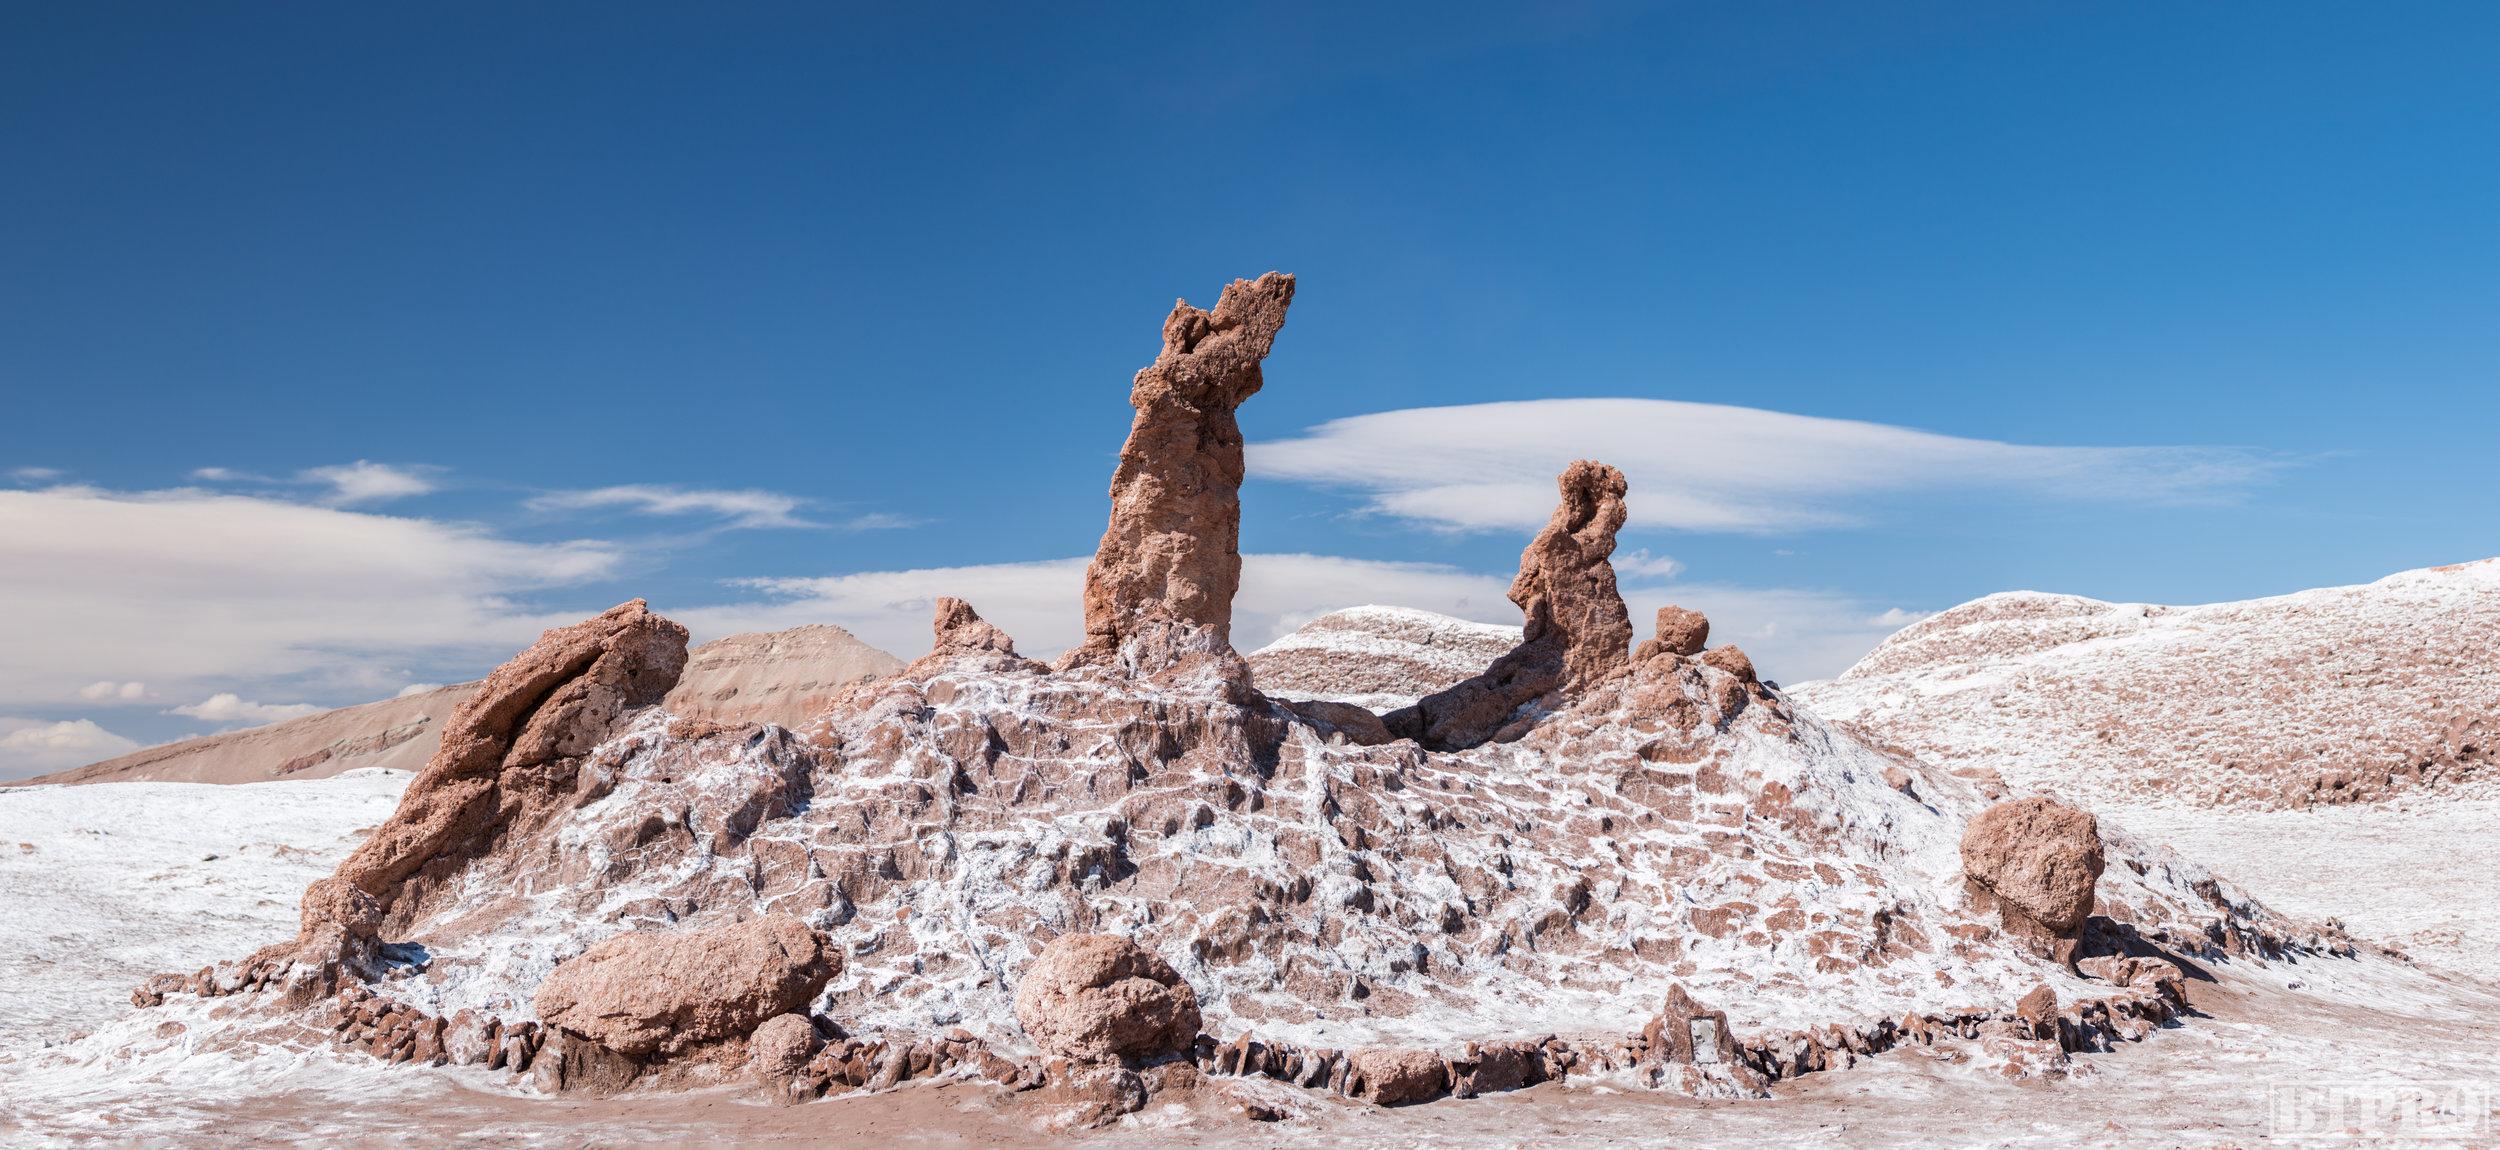 tres marias, 3 marias, valle de la luna, chile, travel, travel photography